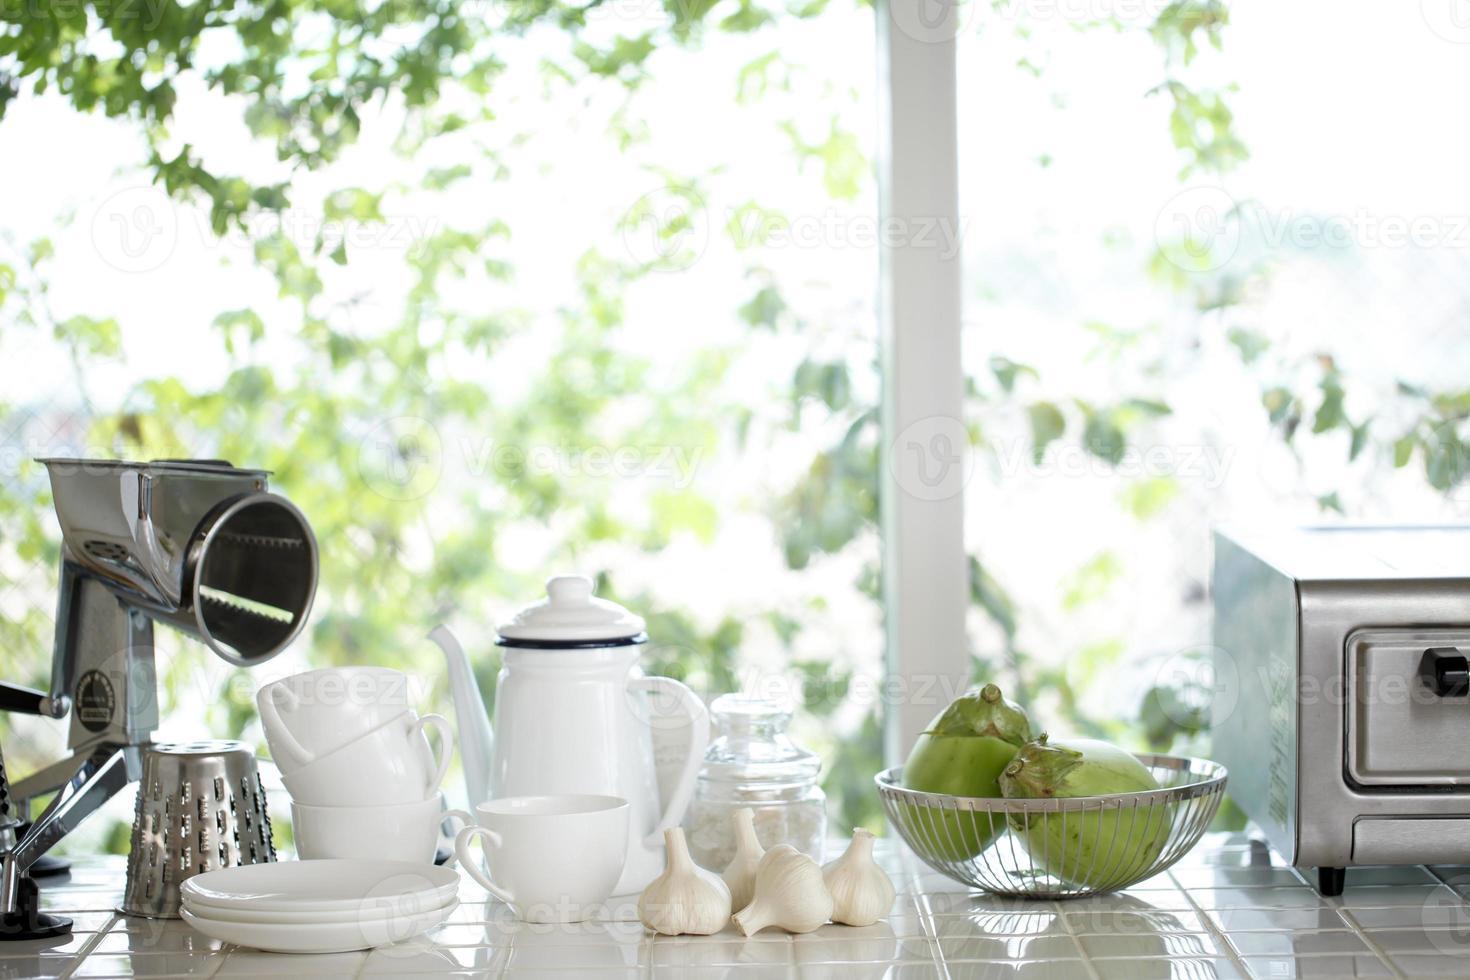 Küche am Morgen foto